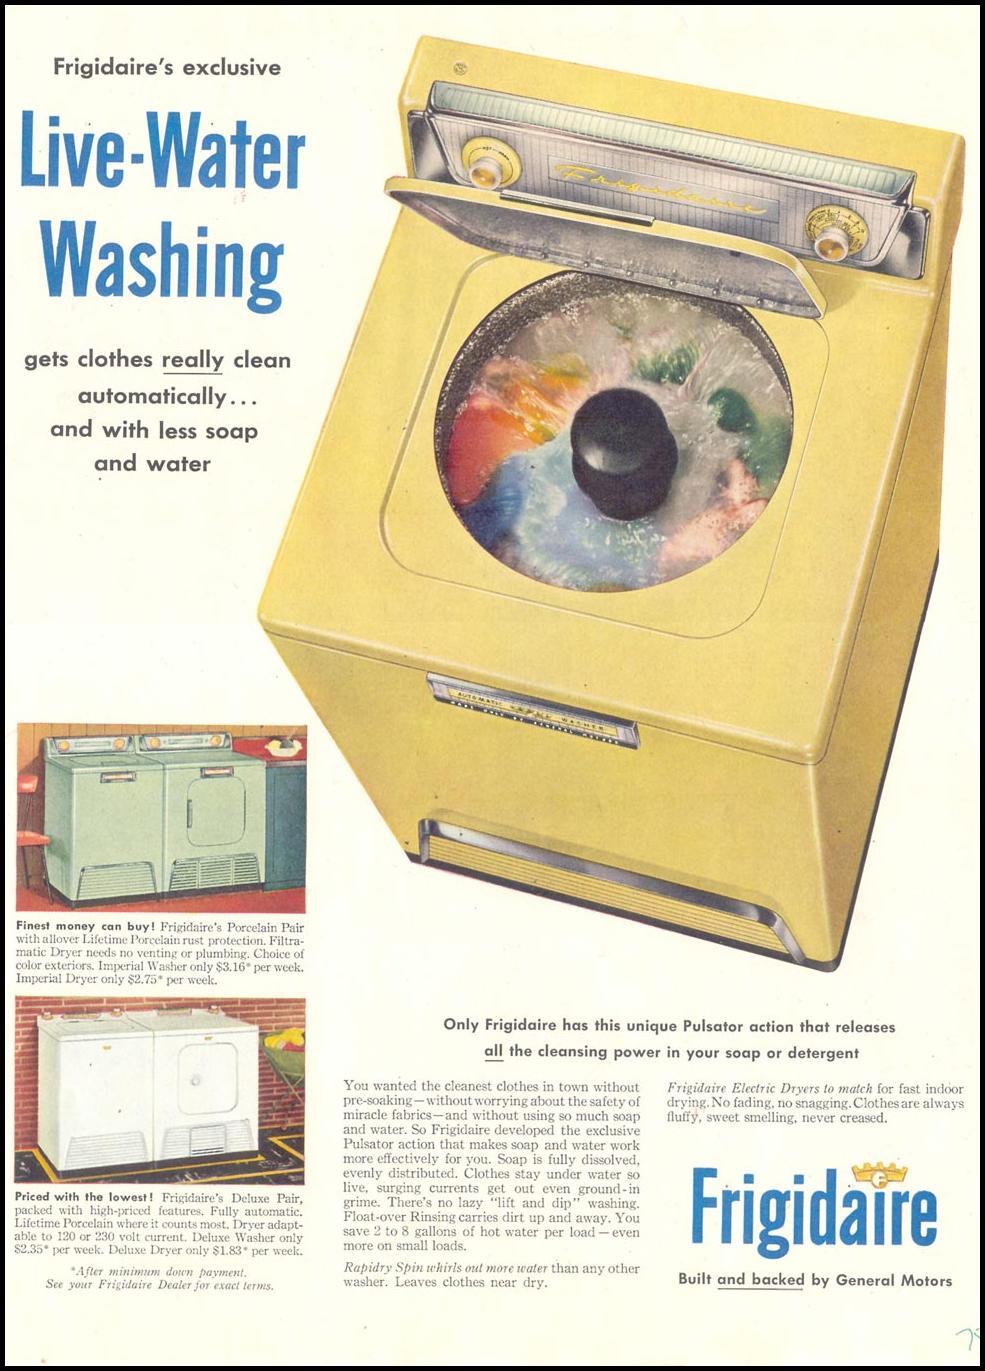 FRIGIDAIRE WASHING MACHINES SATURDAY EVENING POST 03/26/1955 p. 75